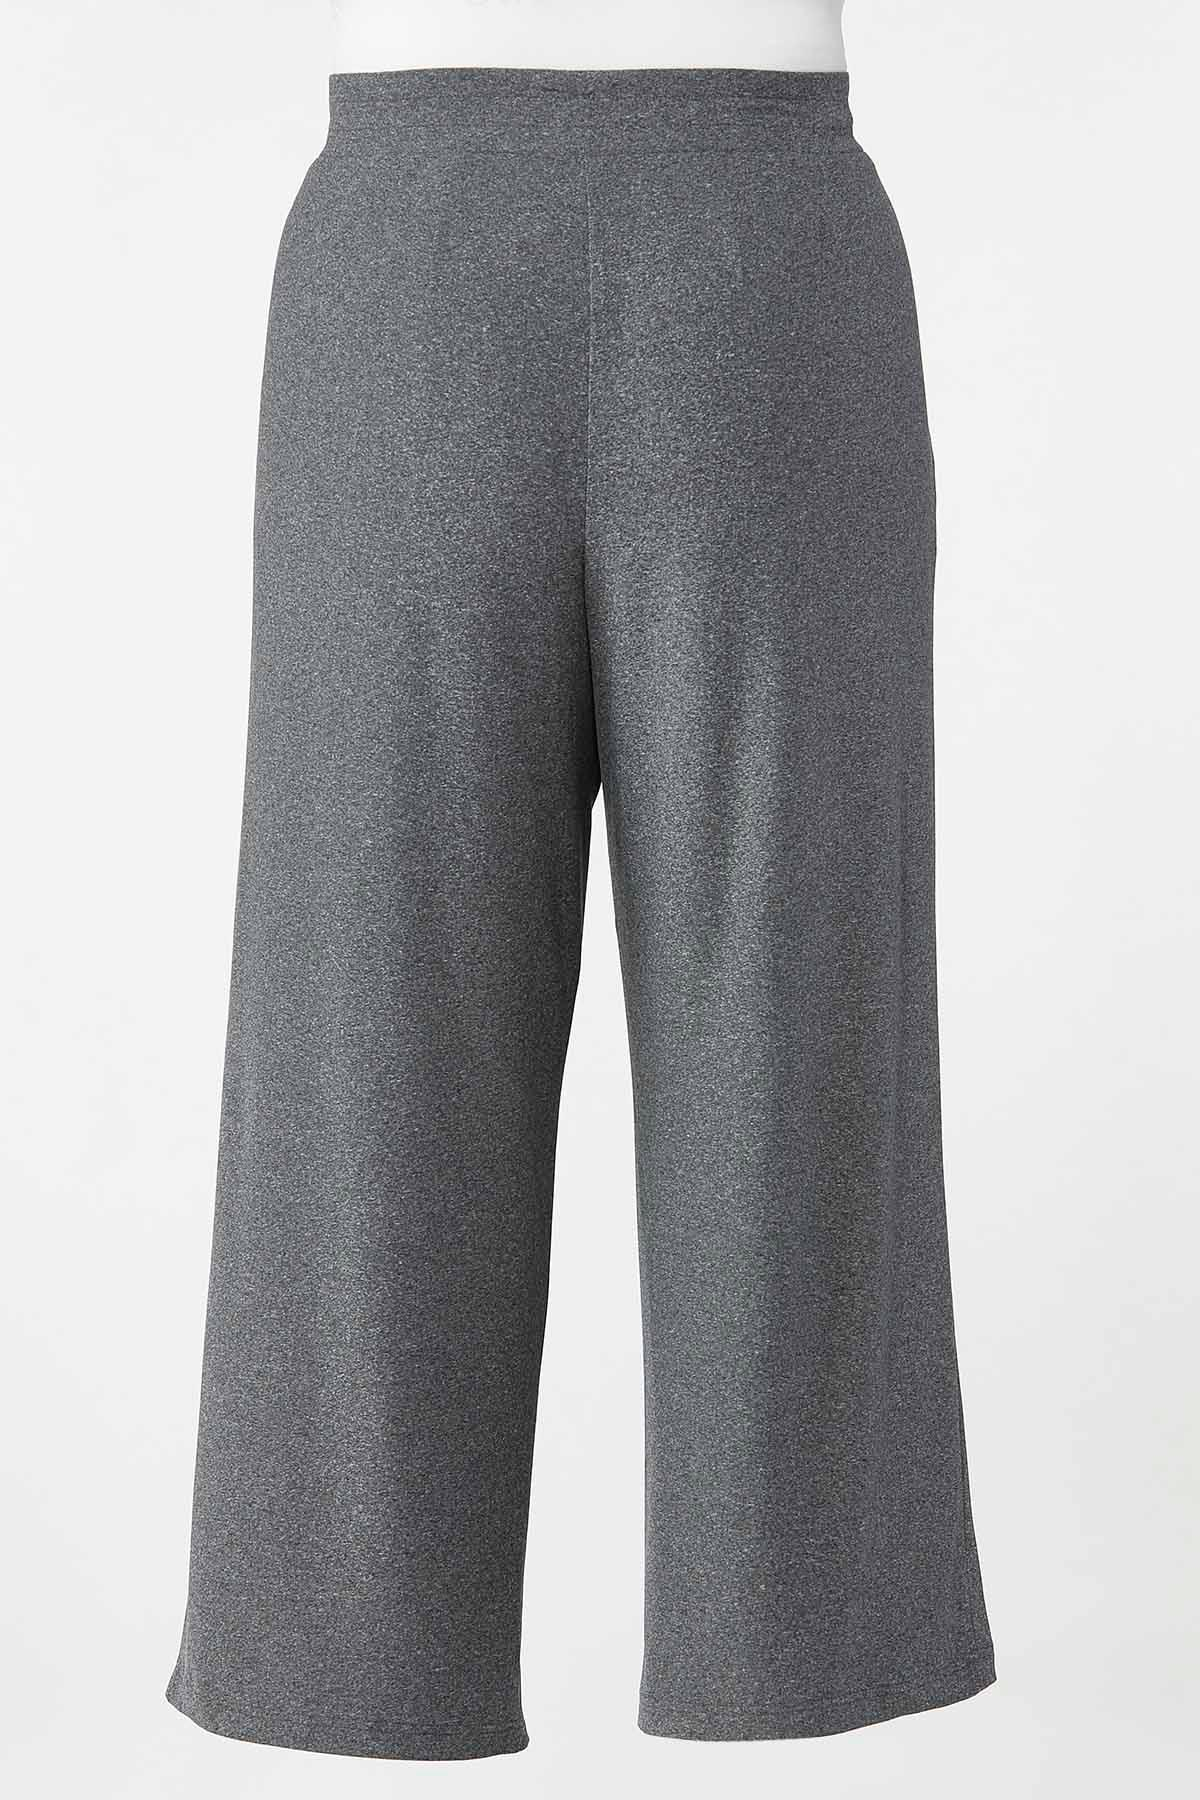 Plus Size Gray Drawstring Pants (Item #44689306)